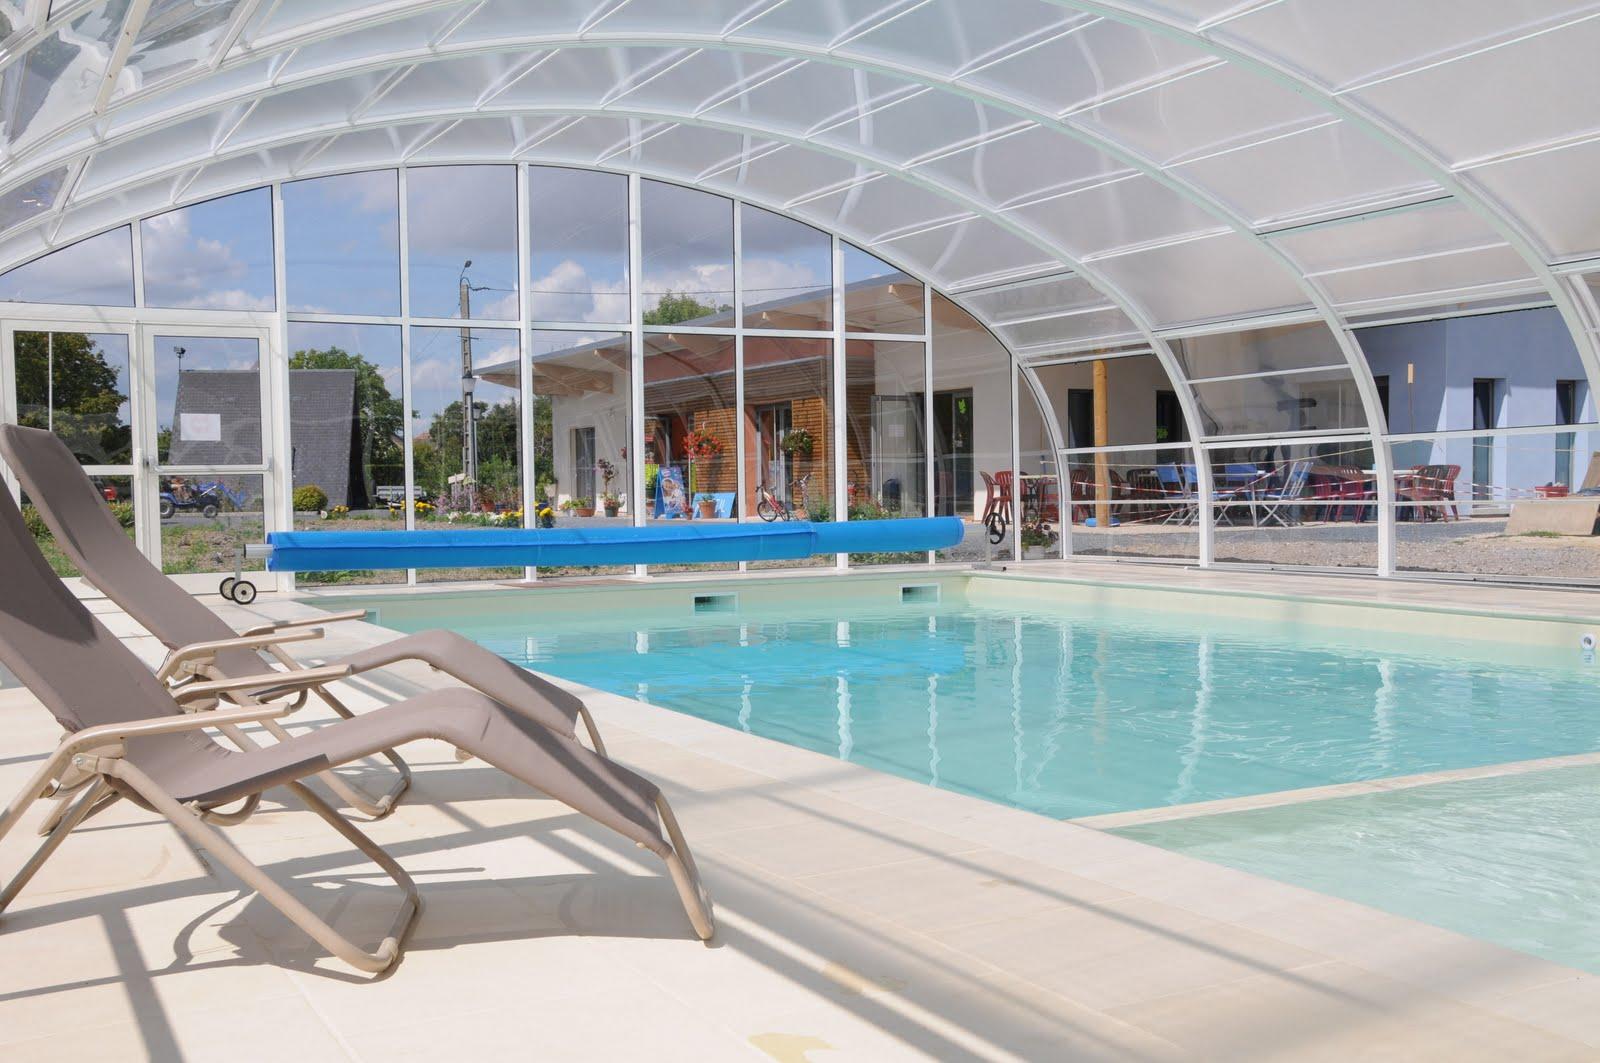 Camping guignicourt 02 aisne la piscine for Camping picardie piscine